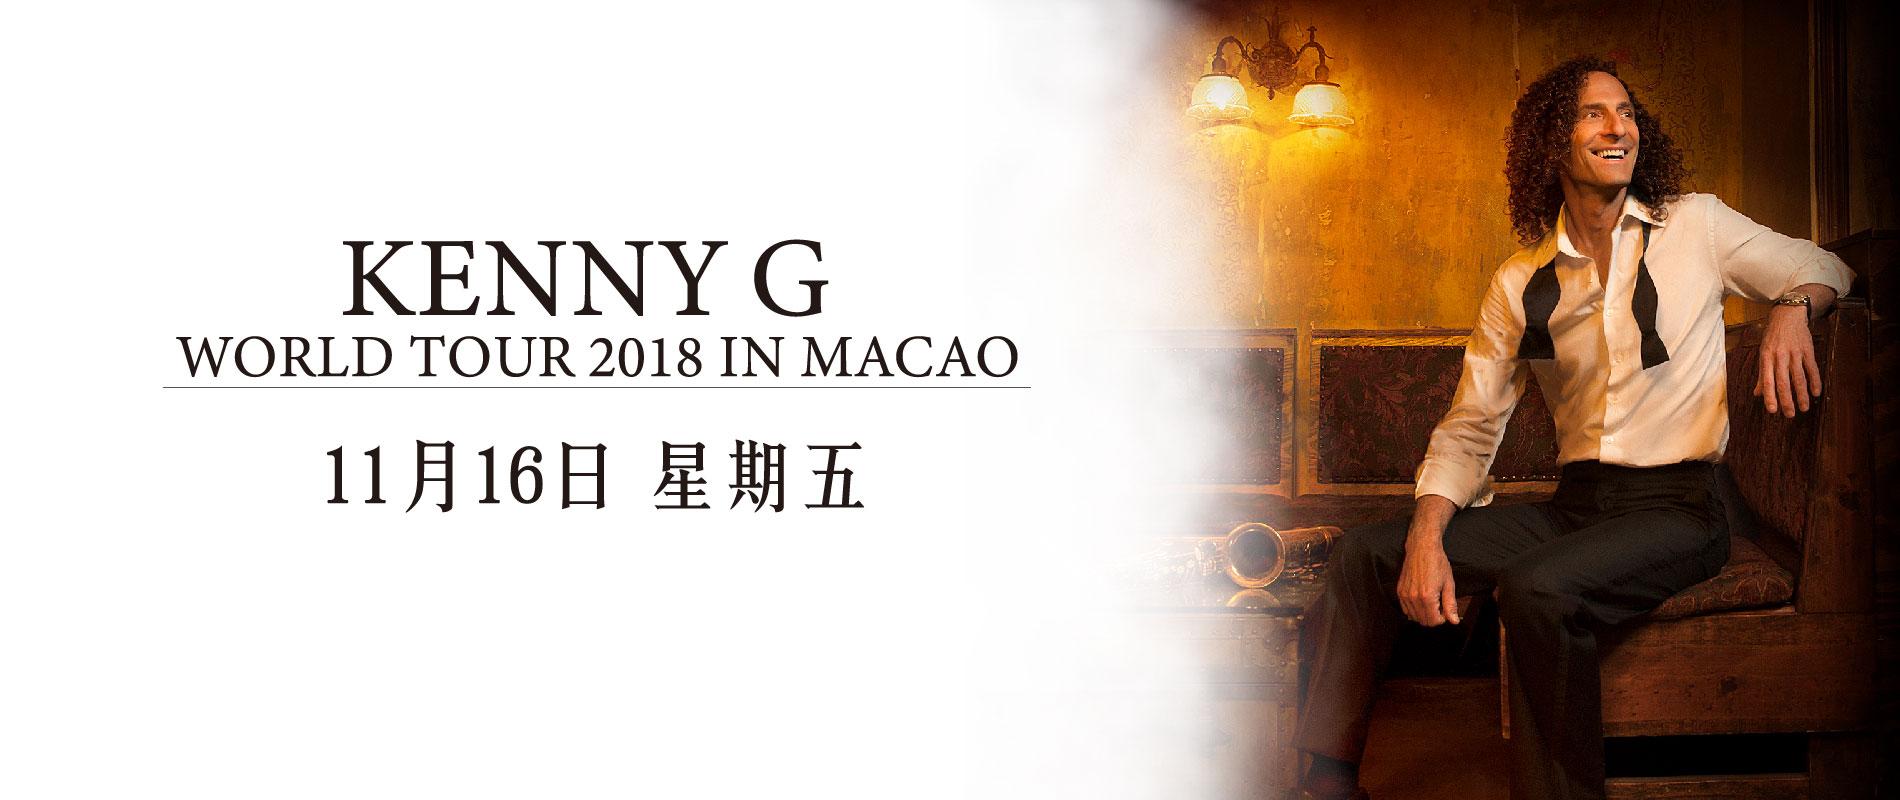 KENNY G WORLD TOUR 2018 IN MACAO - 威尼斯人剧场